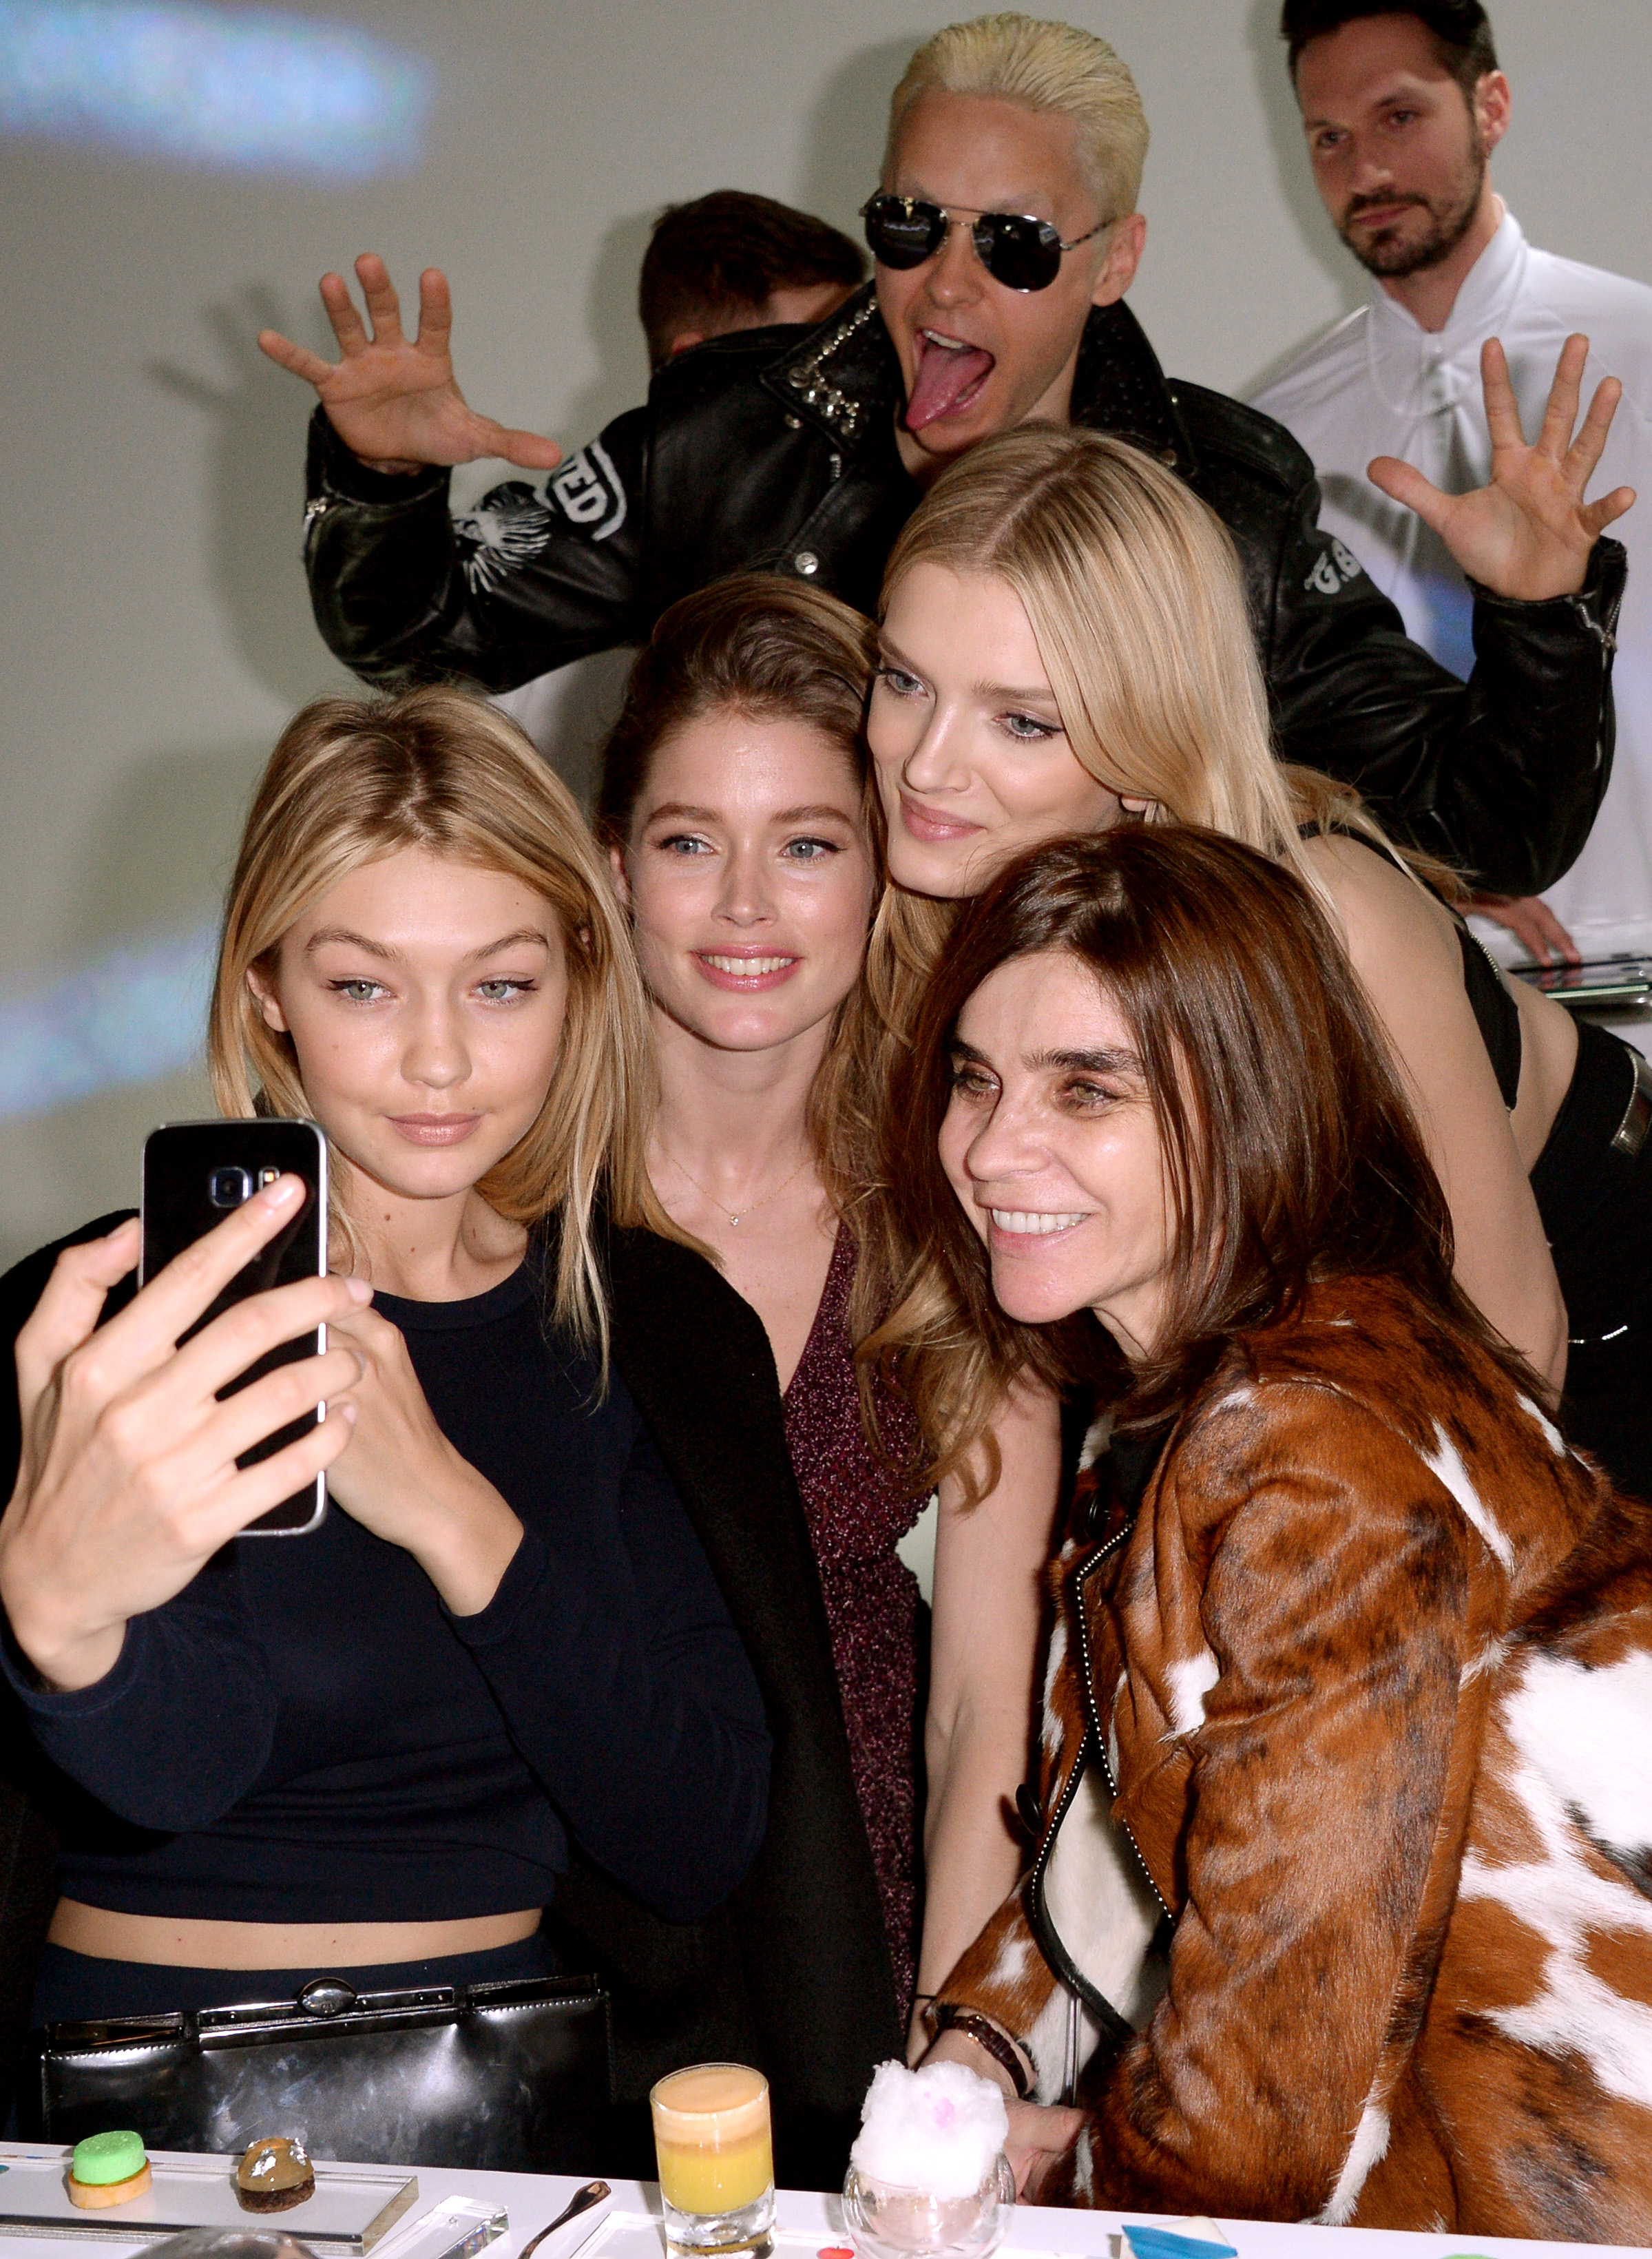 Jared Leto photobombs Gigi Hadid, Doutzen Kroes, Lily Donaldson and Carine Roitfeld (Photo: Getty).